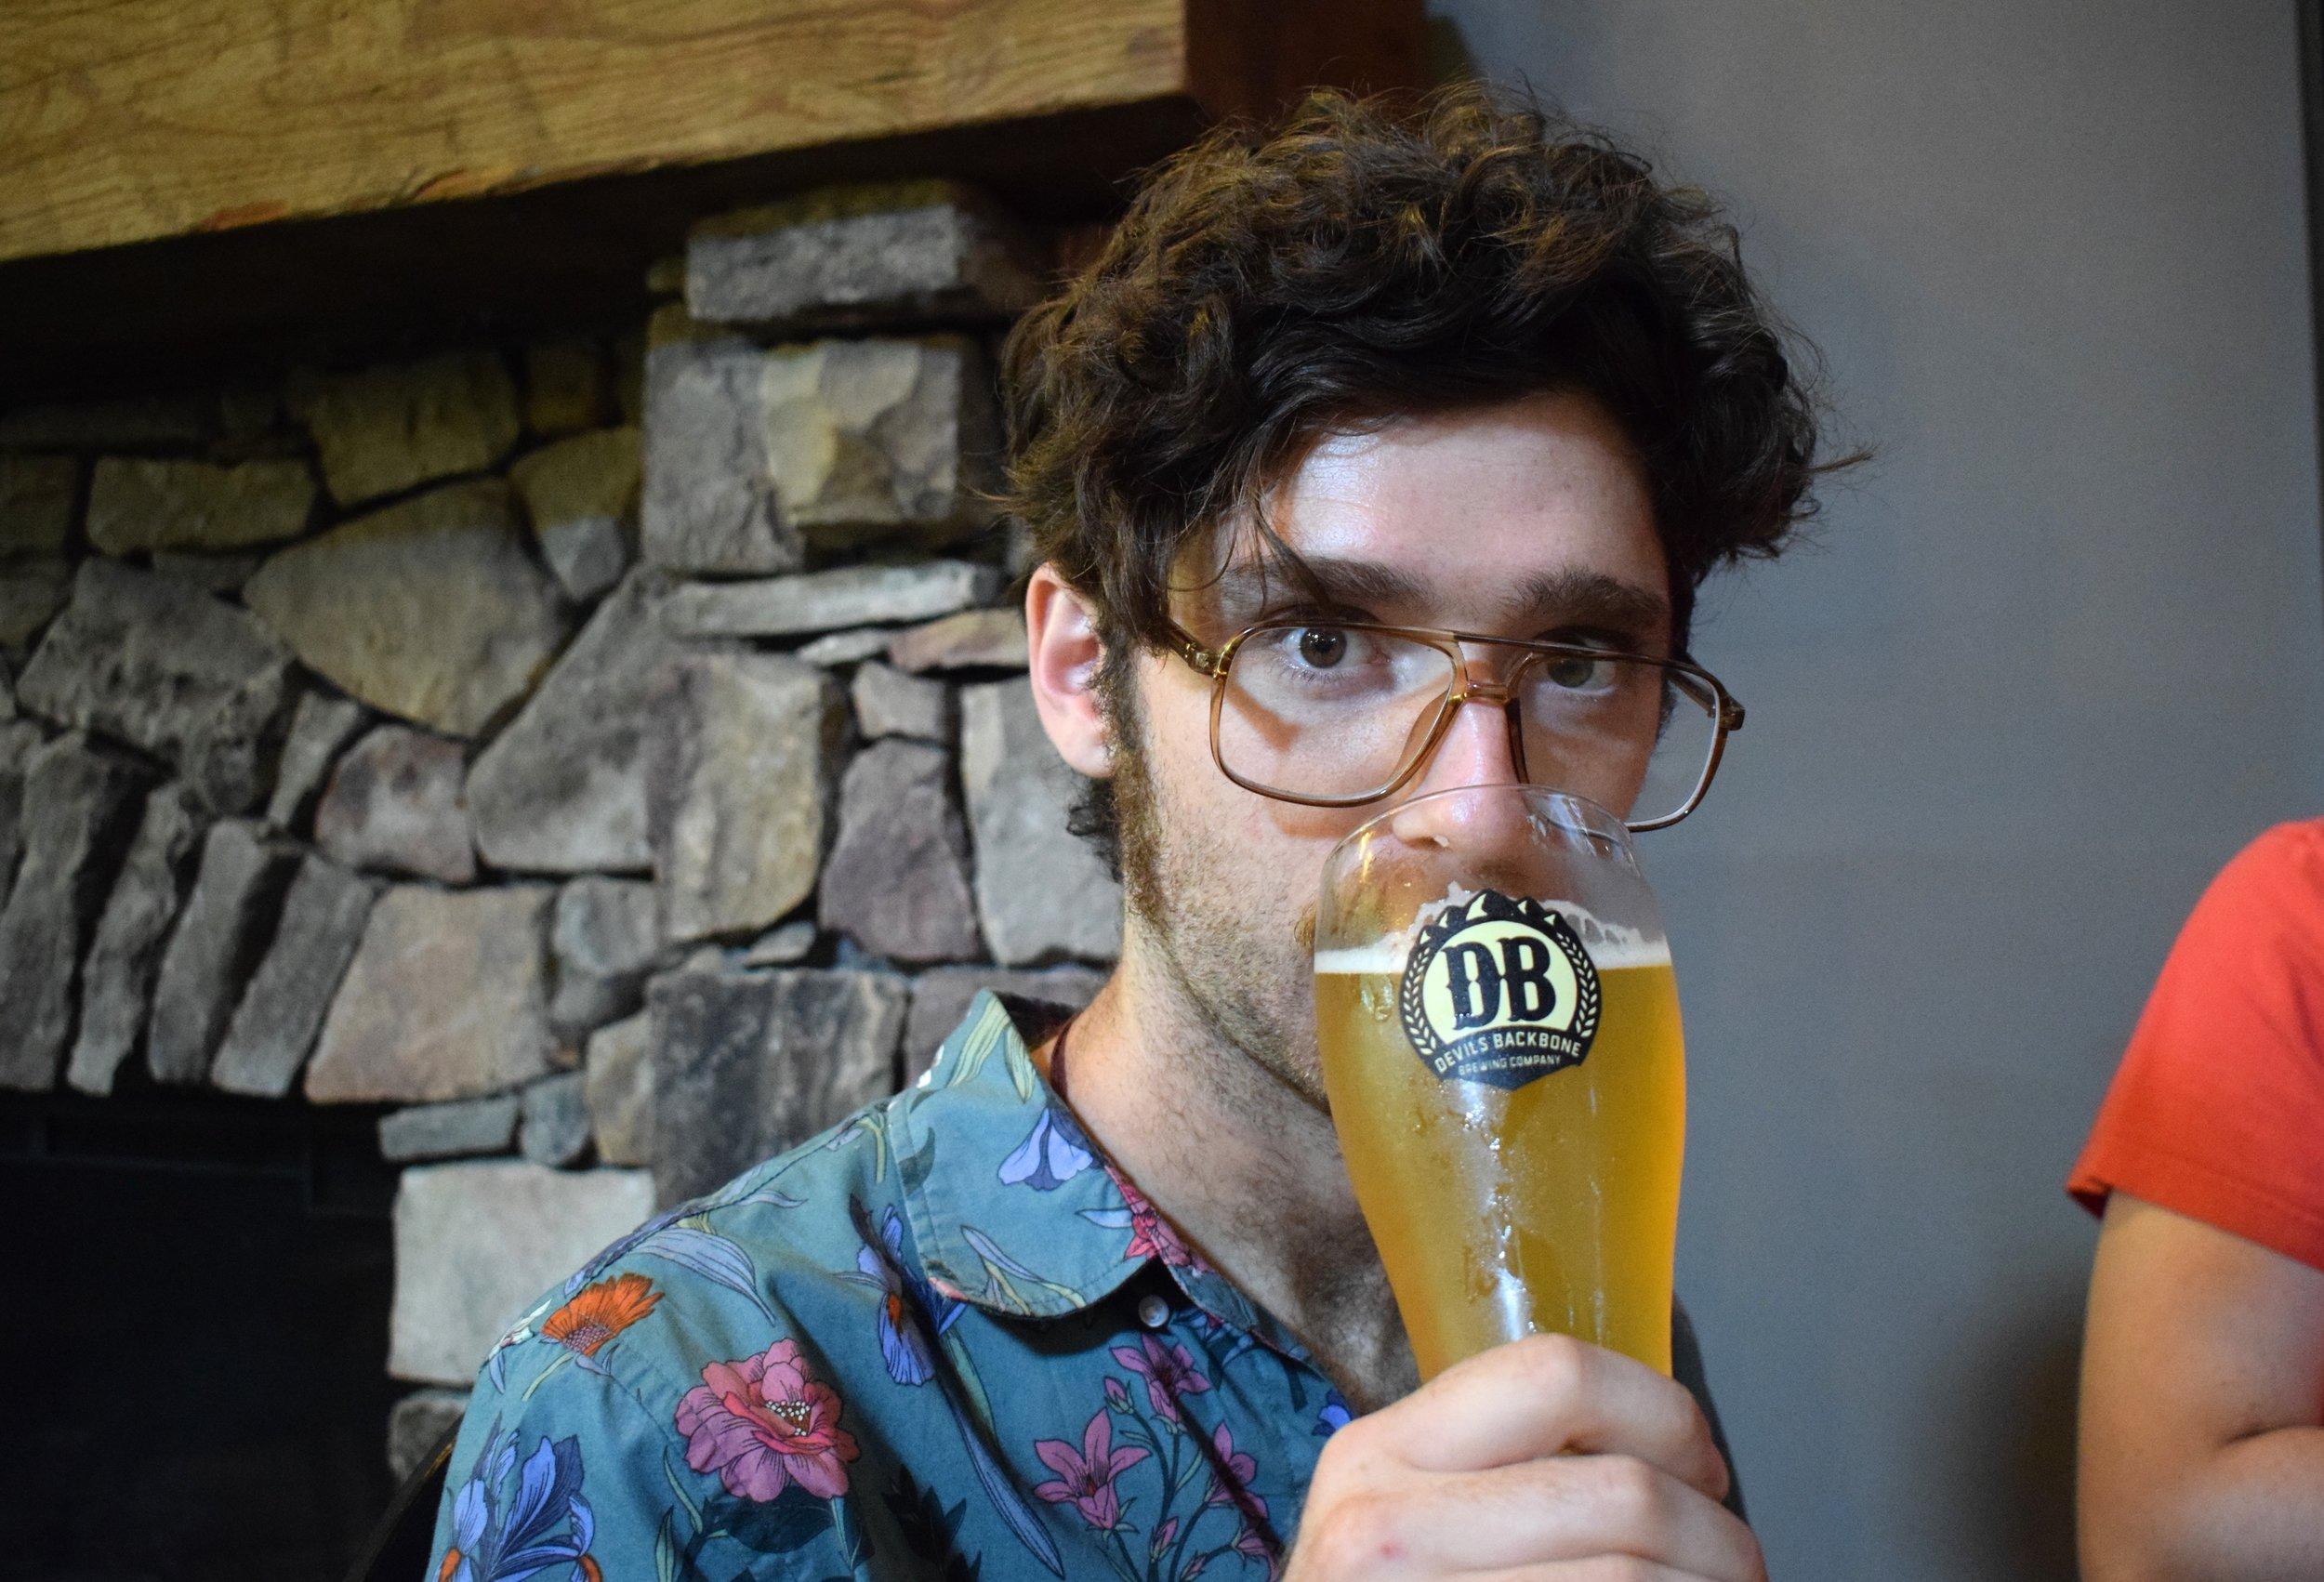 Emmett drinking inside Devil's Backbone Brewpub.